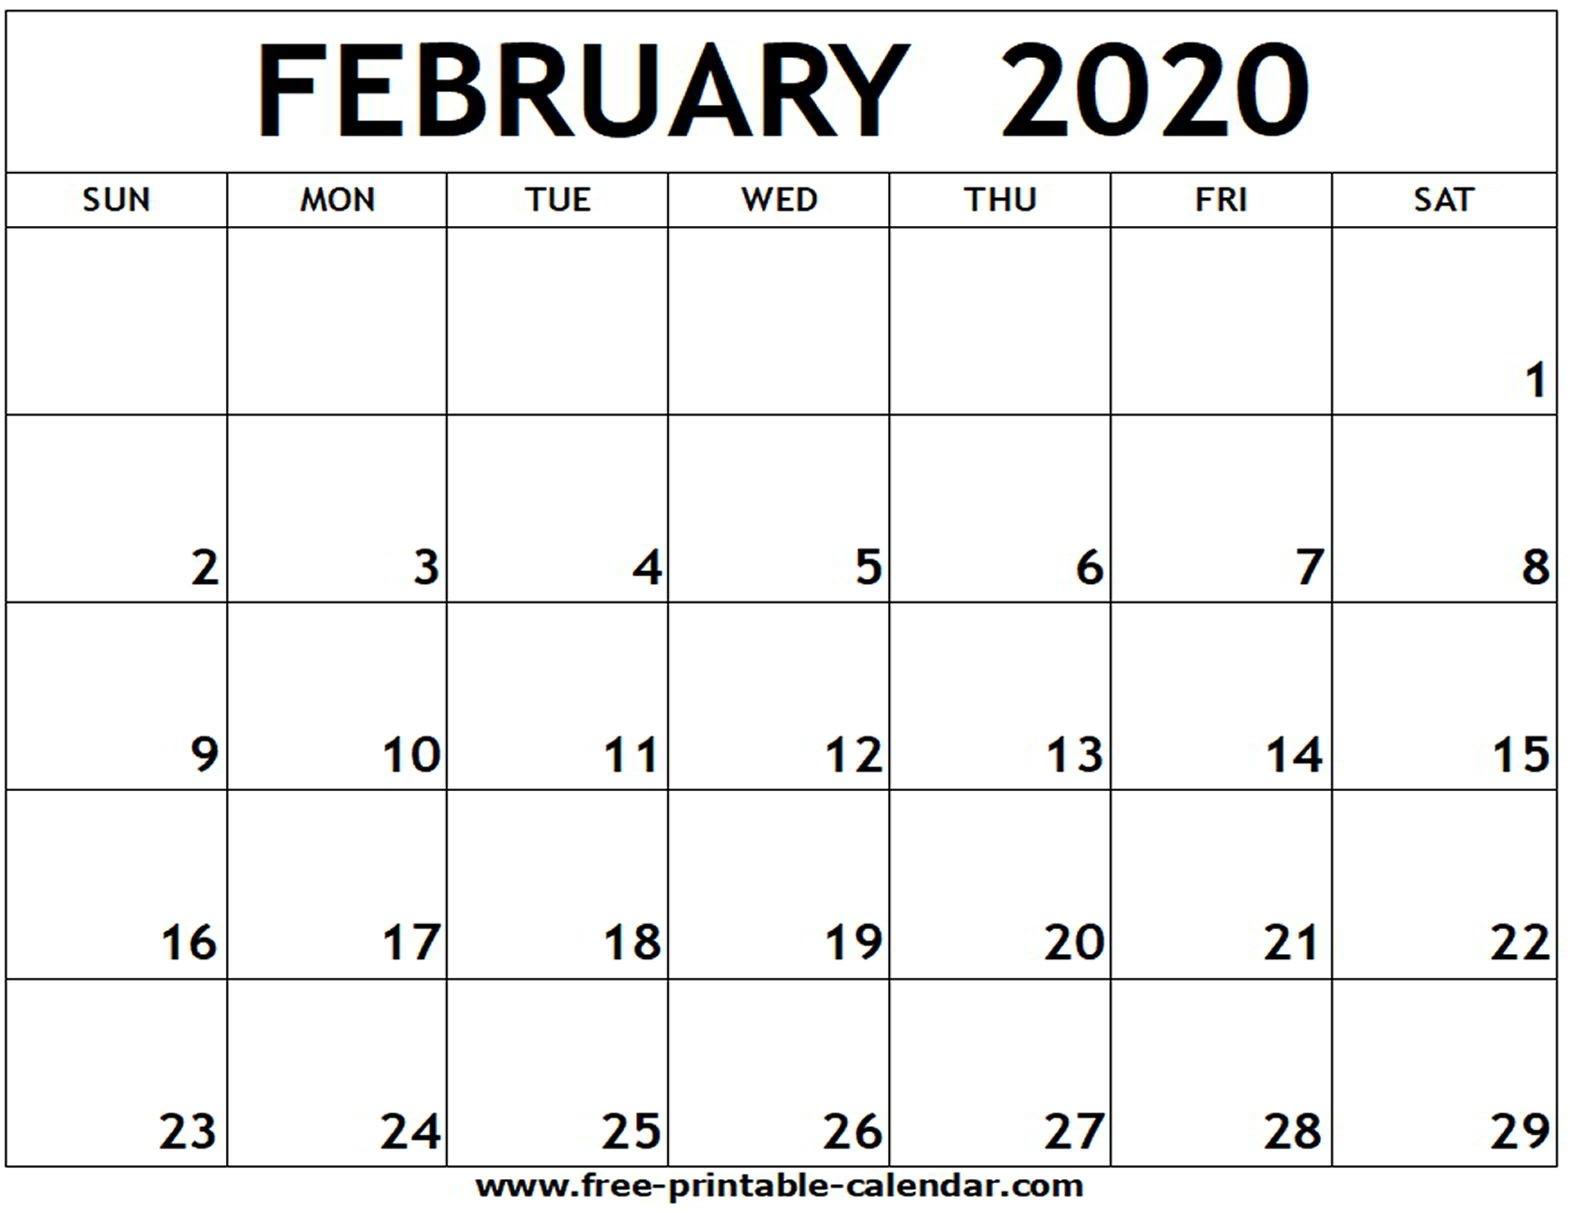 February 2020 Printable Calendar - Free-Printable-Calendar-January And February 2020 Printable Calendar